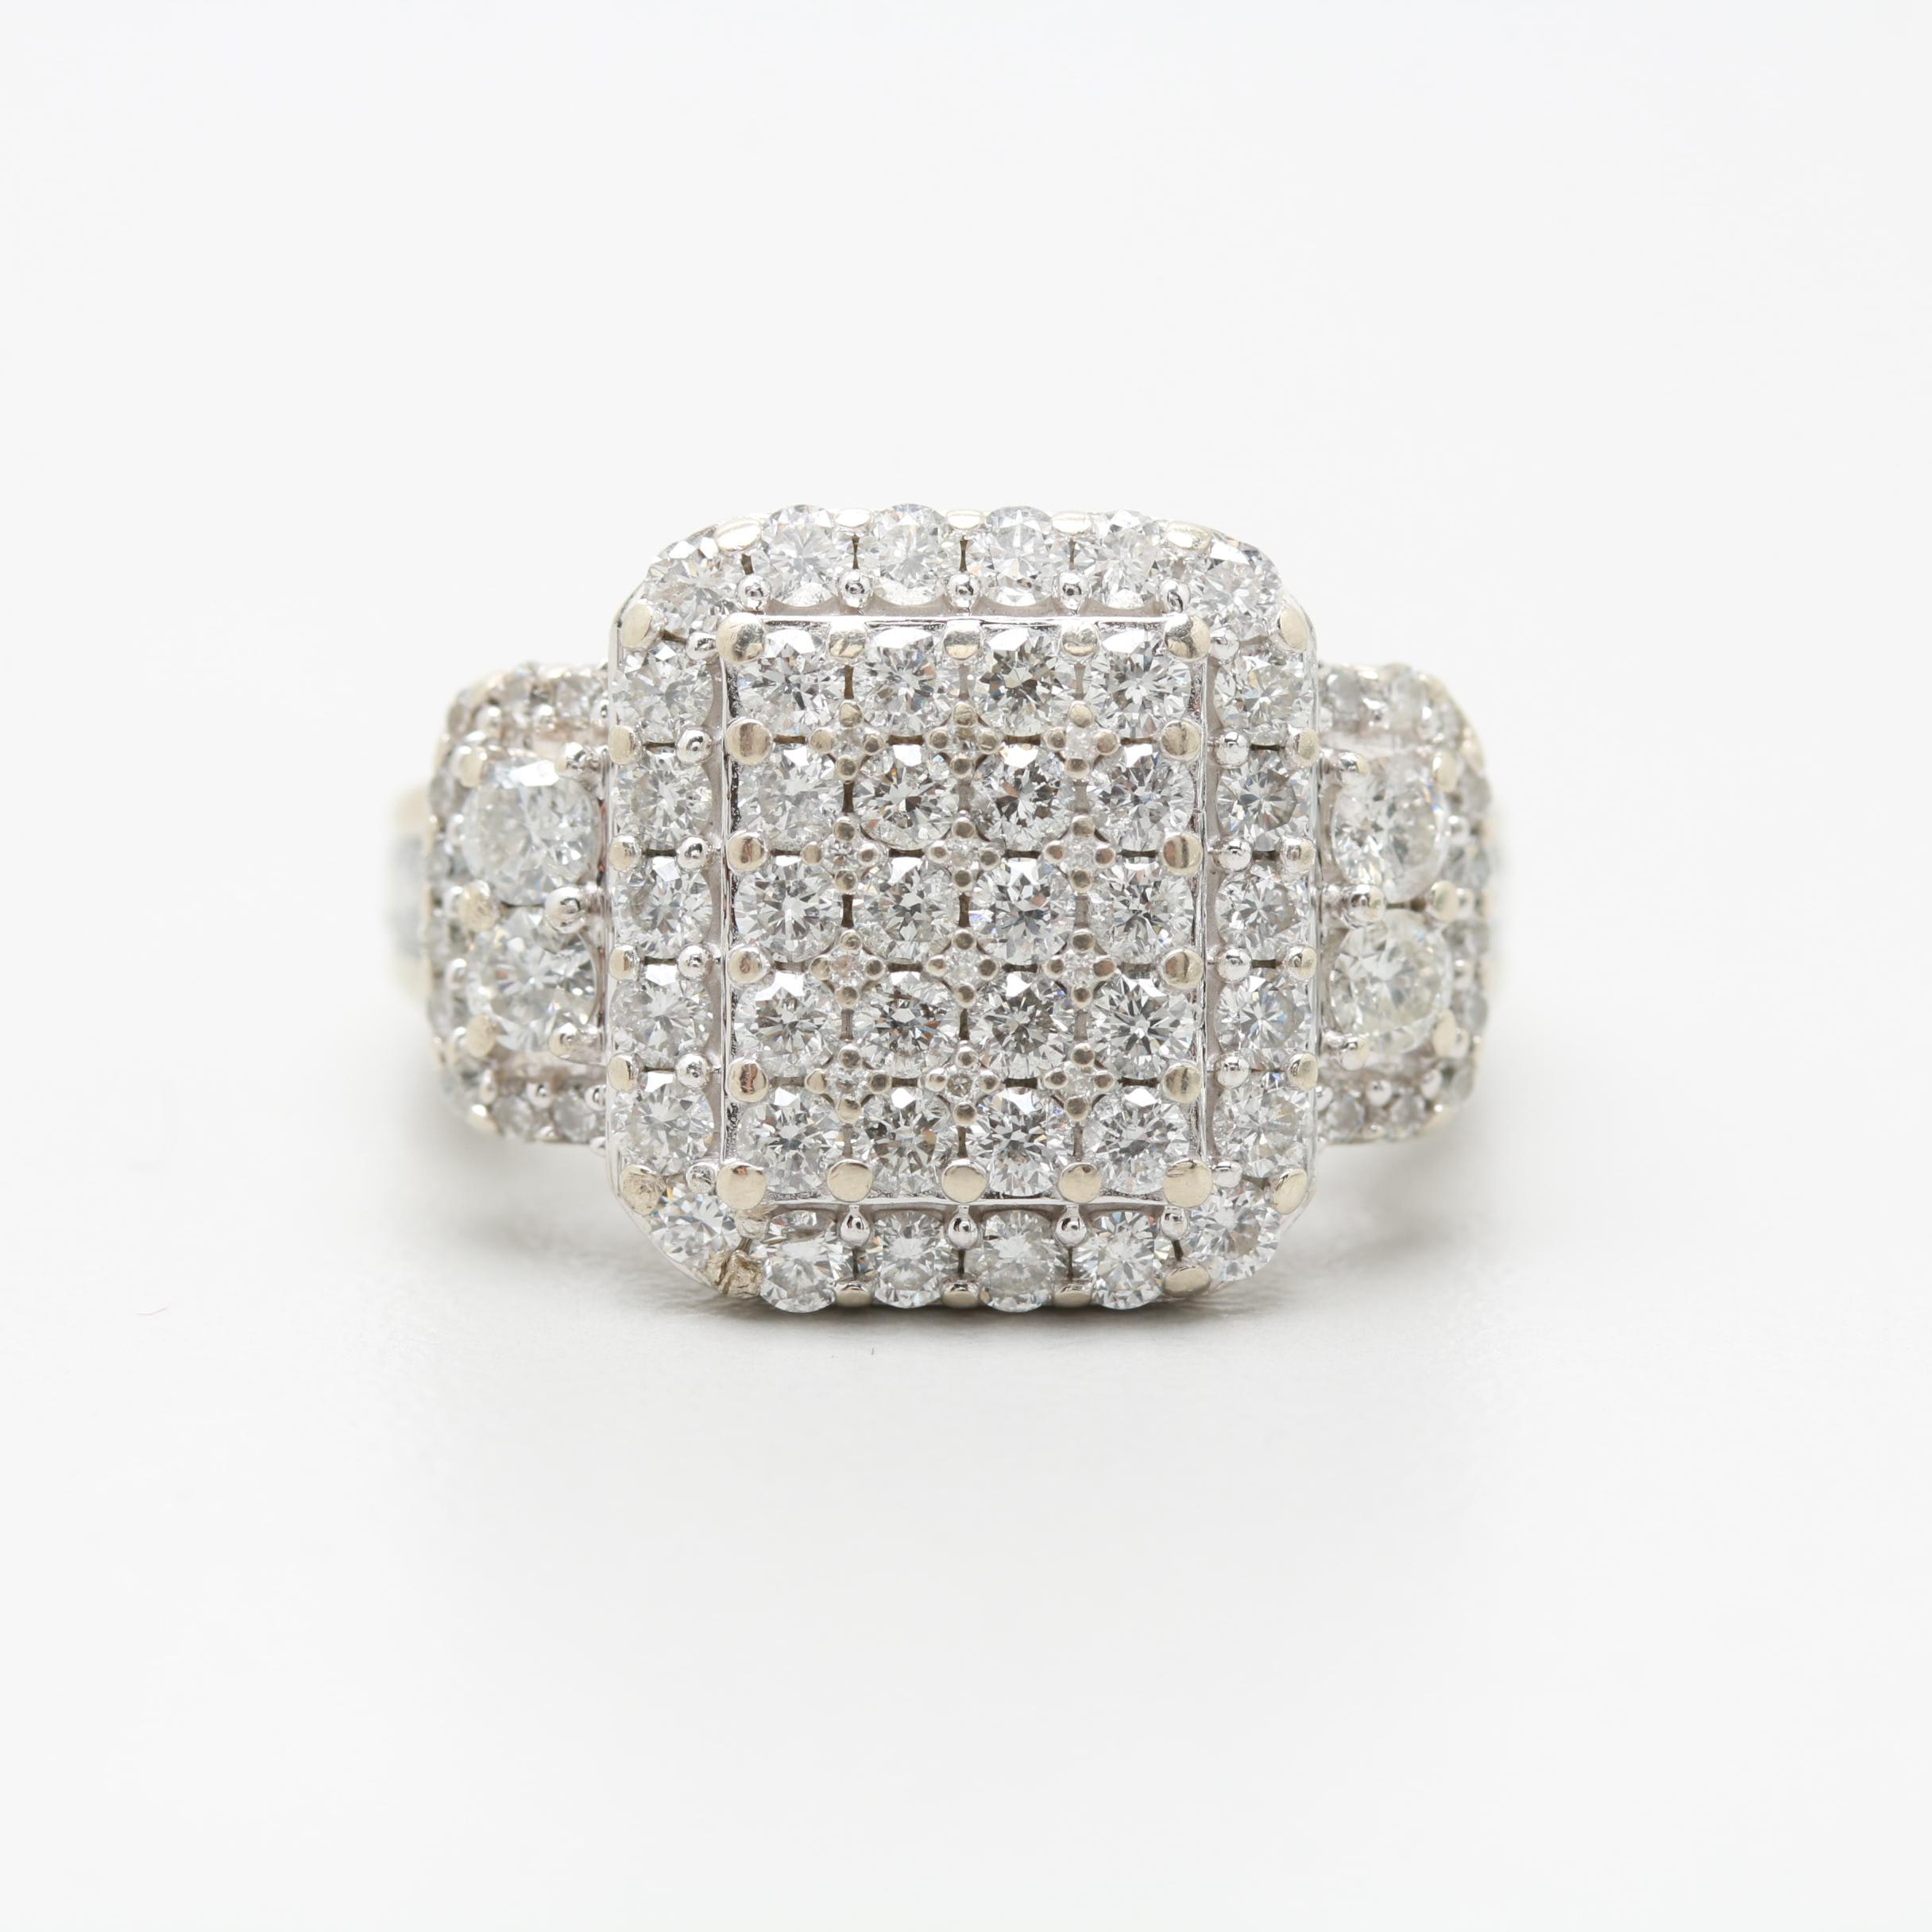 14K White Gold 1.92 CTW Diamond Ring